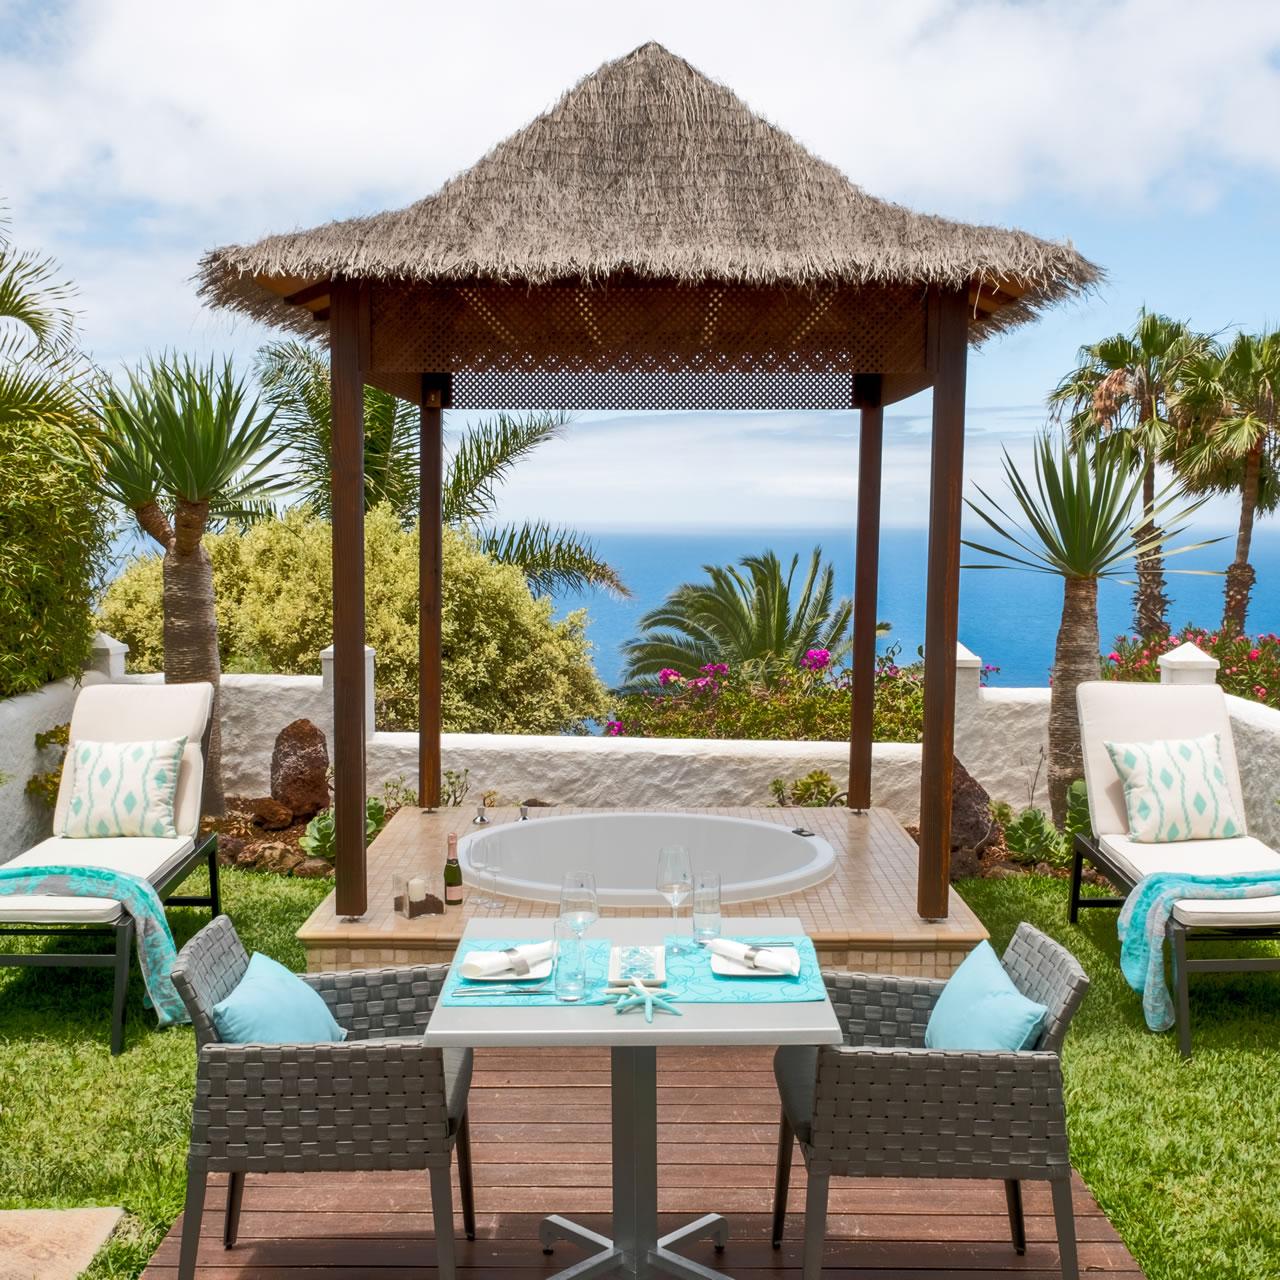 Casa san marco im jardin de la paz design suite mit meerblick - Whirlpool pavillon ...